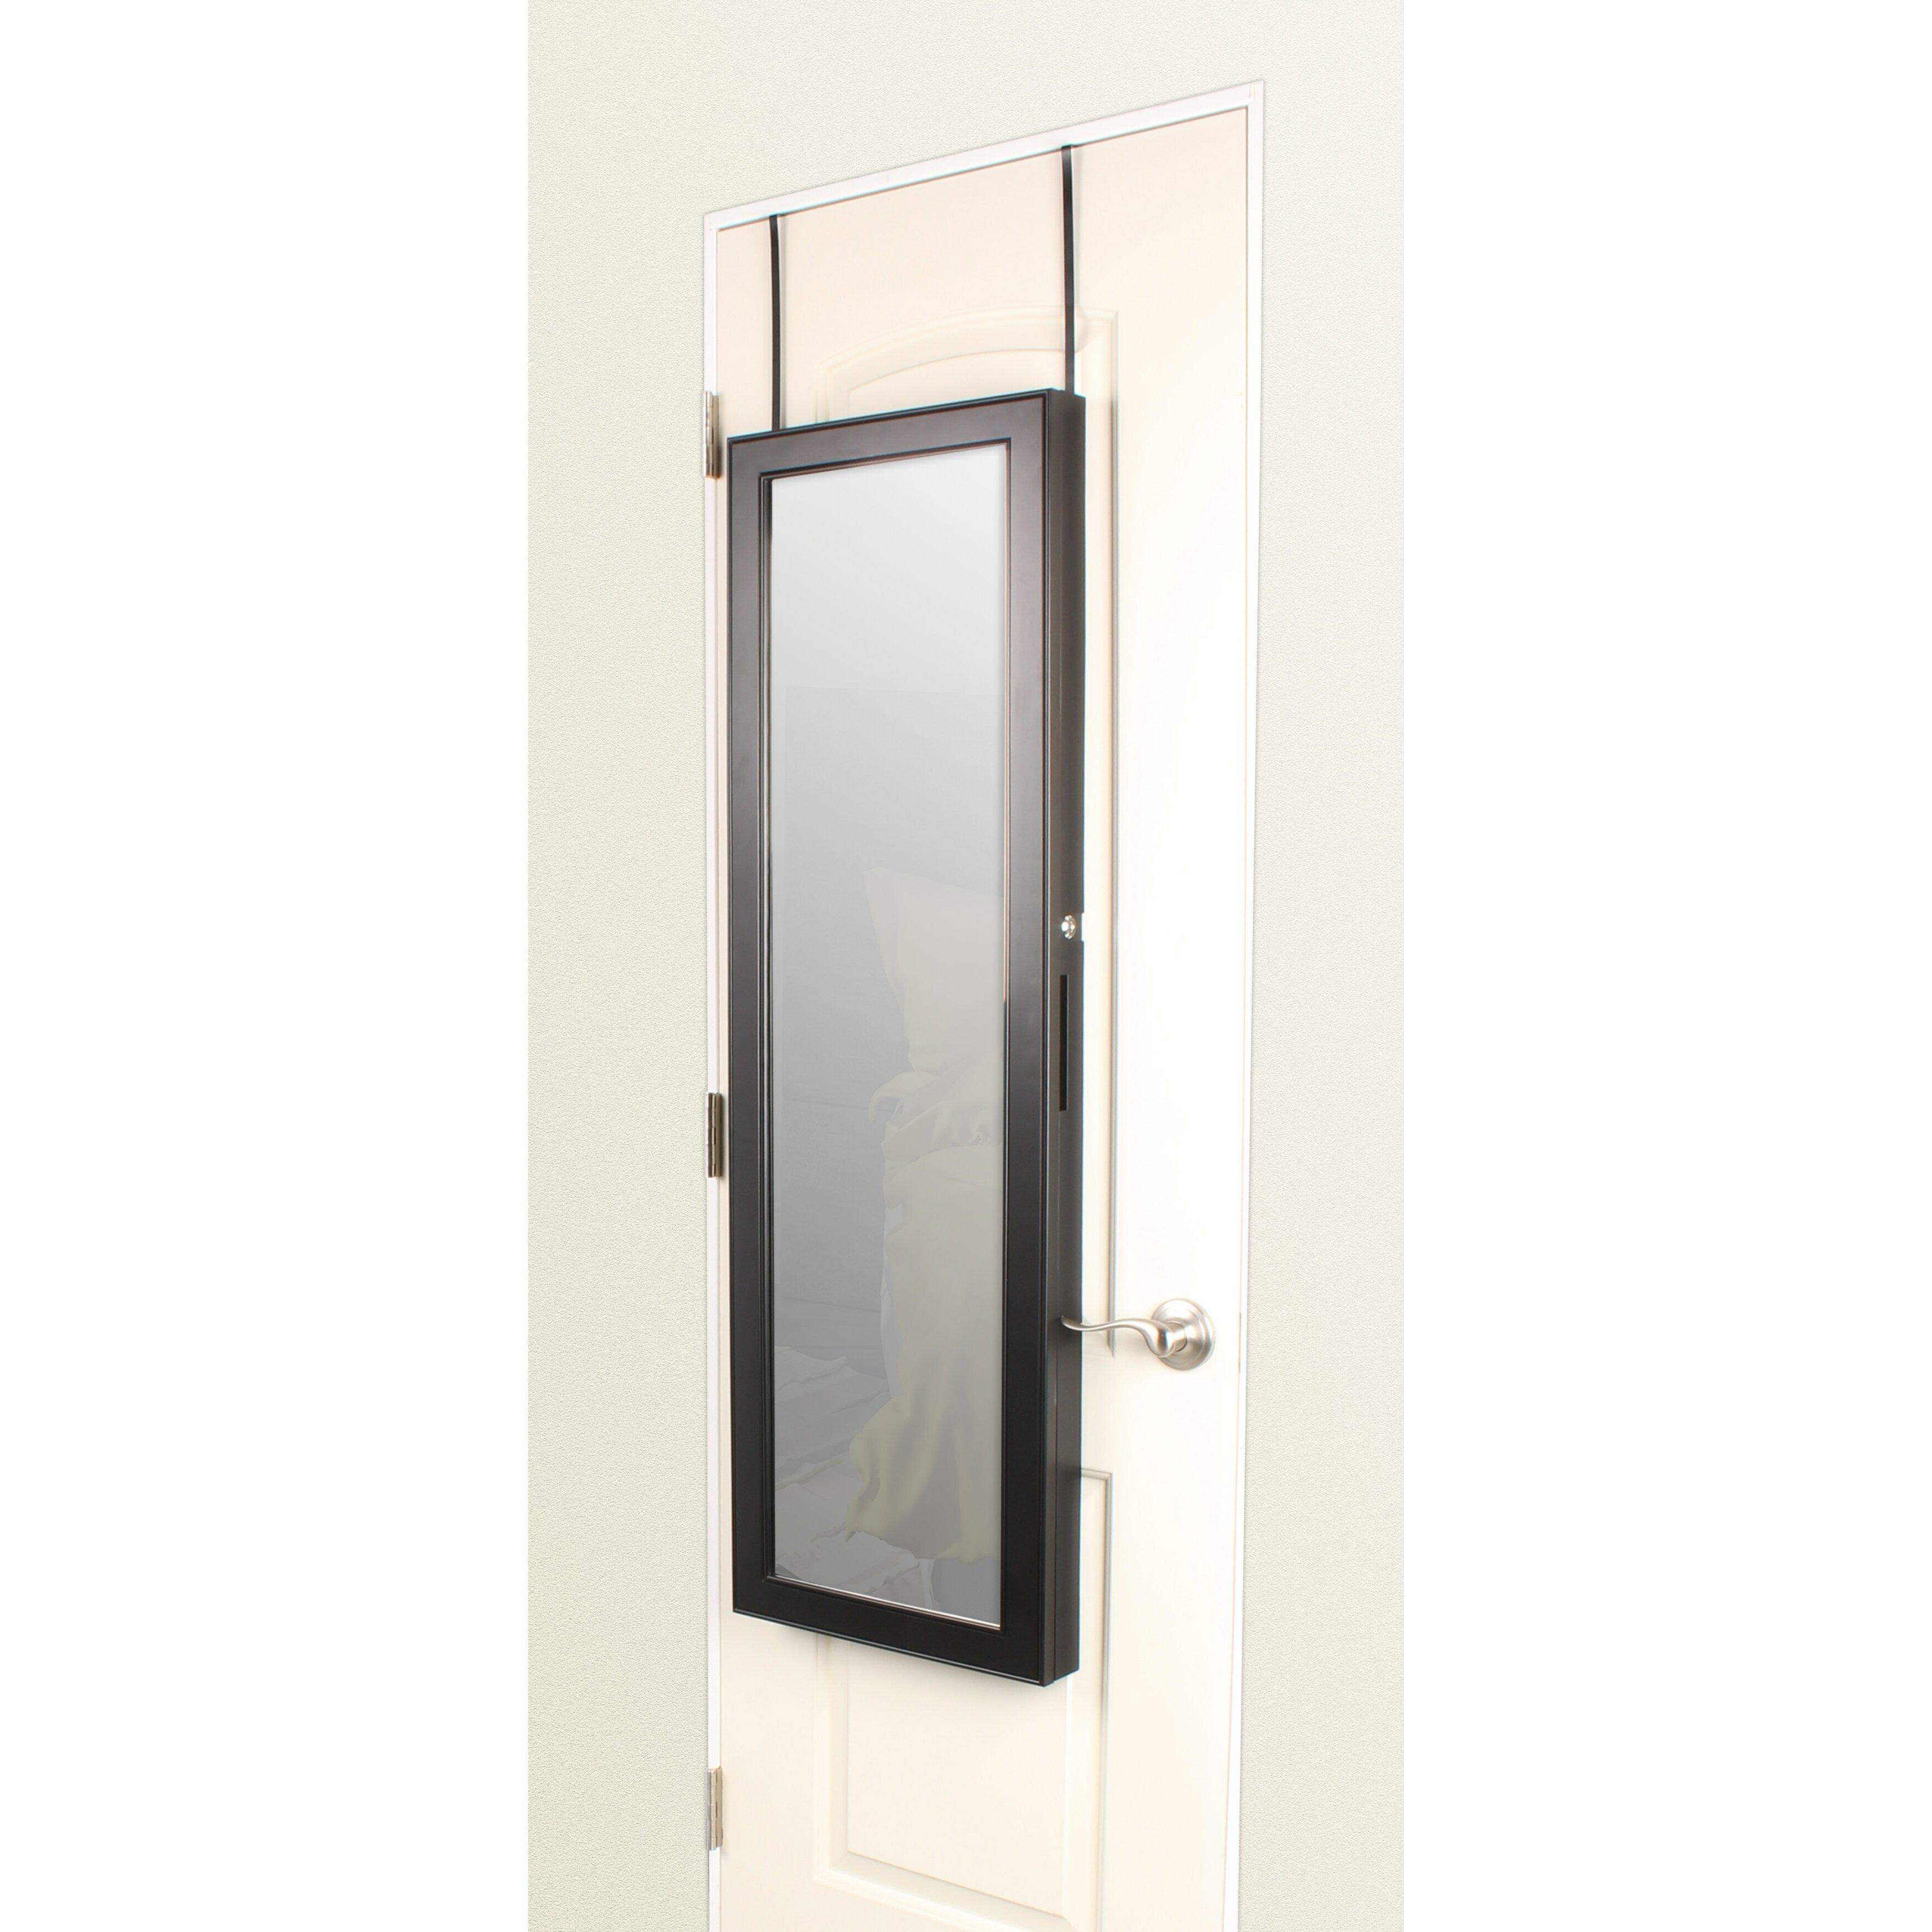 Uniek Storage Over The Door Jewelry Armoire With Mirror